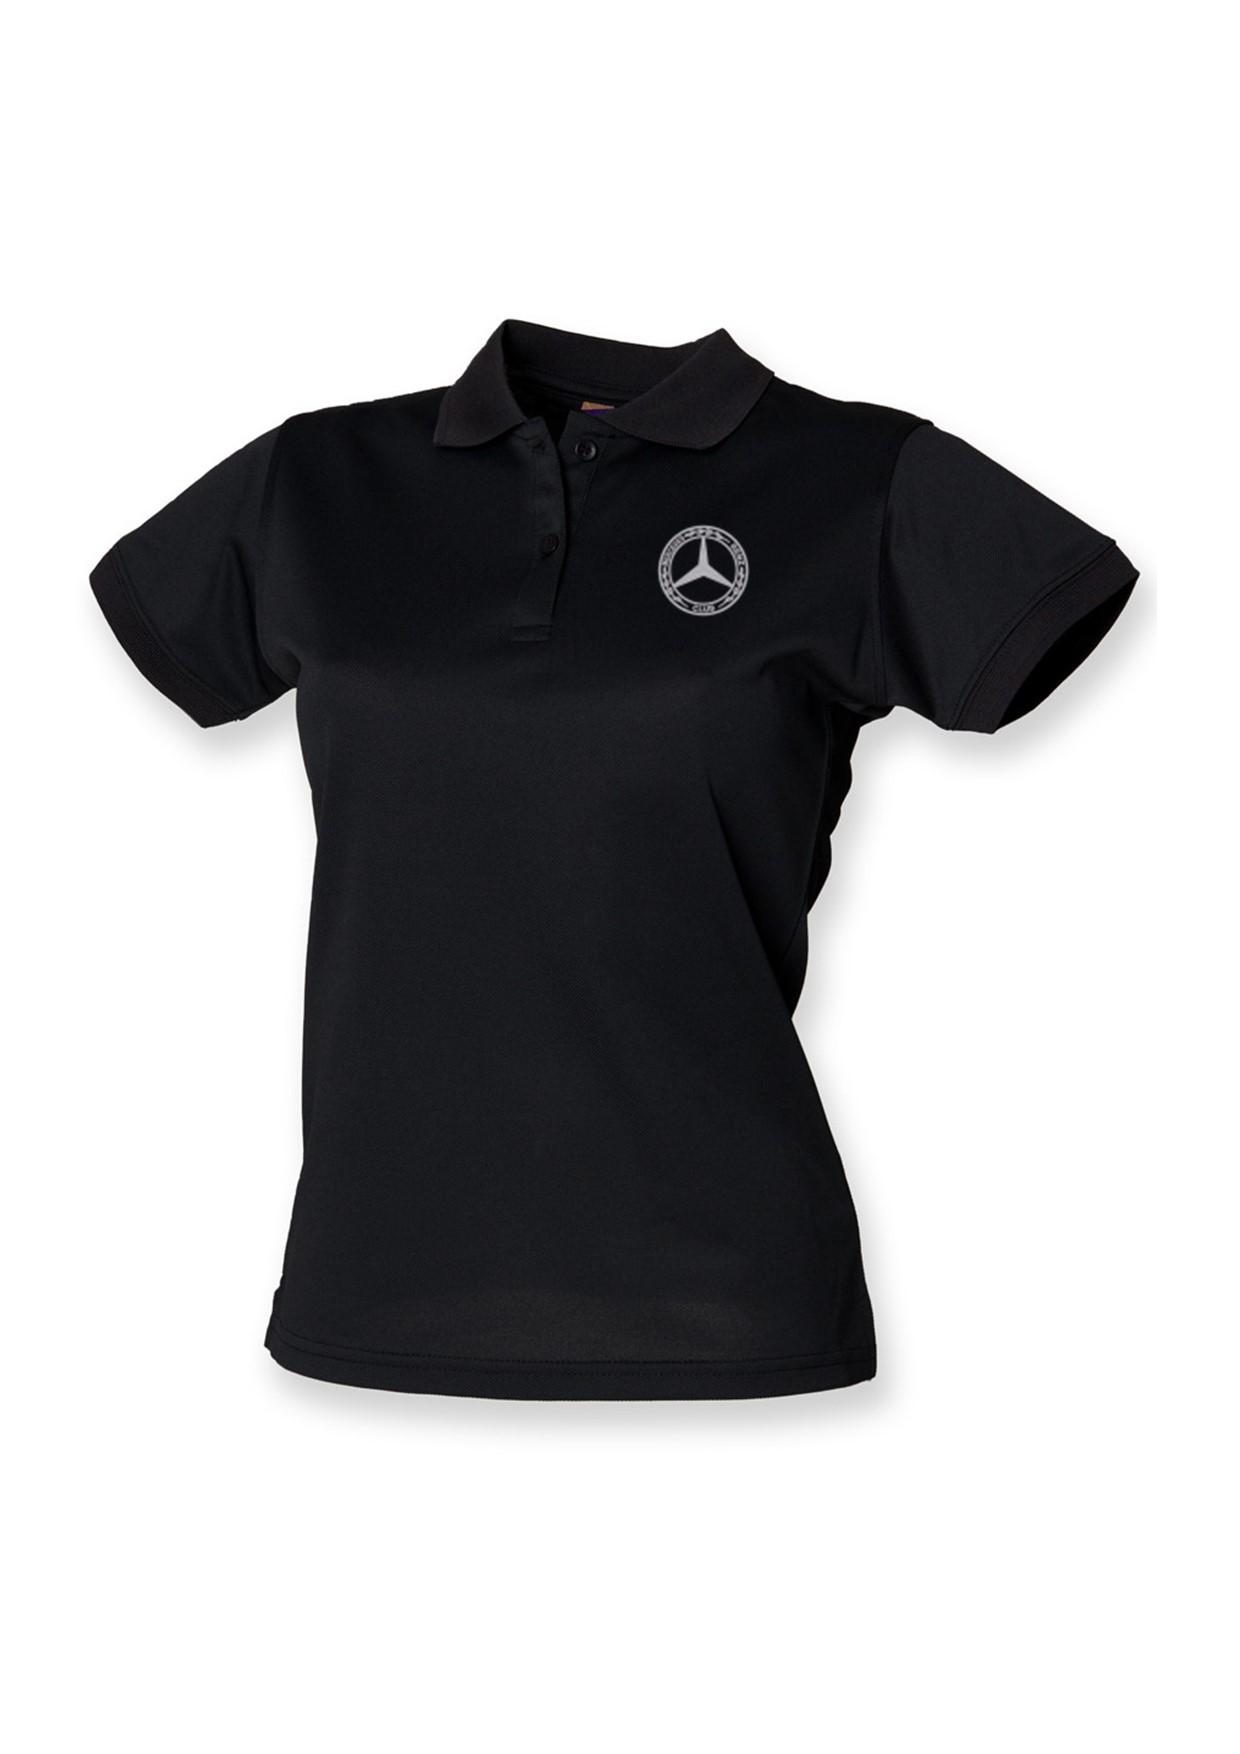 Mercedes-Benz Club Ladies Coolplus Wicking Pique Polo Shirt Black